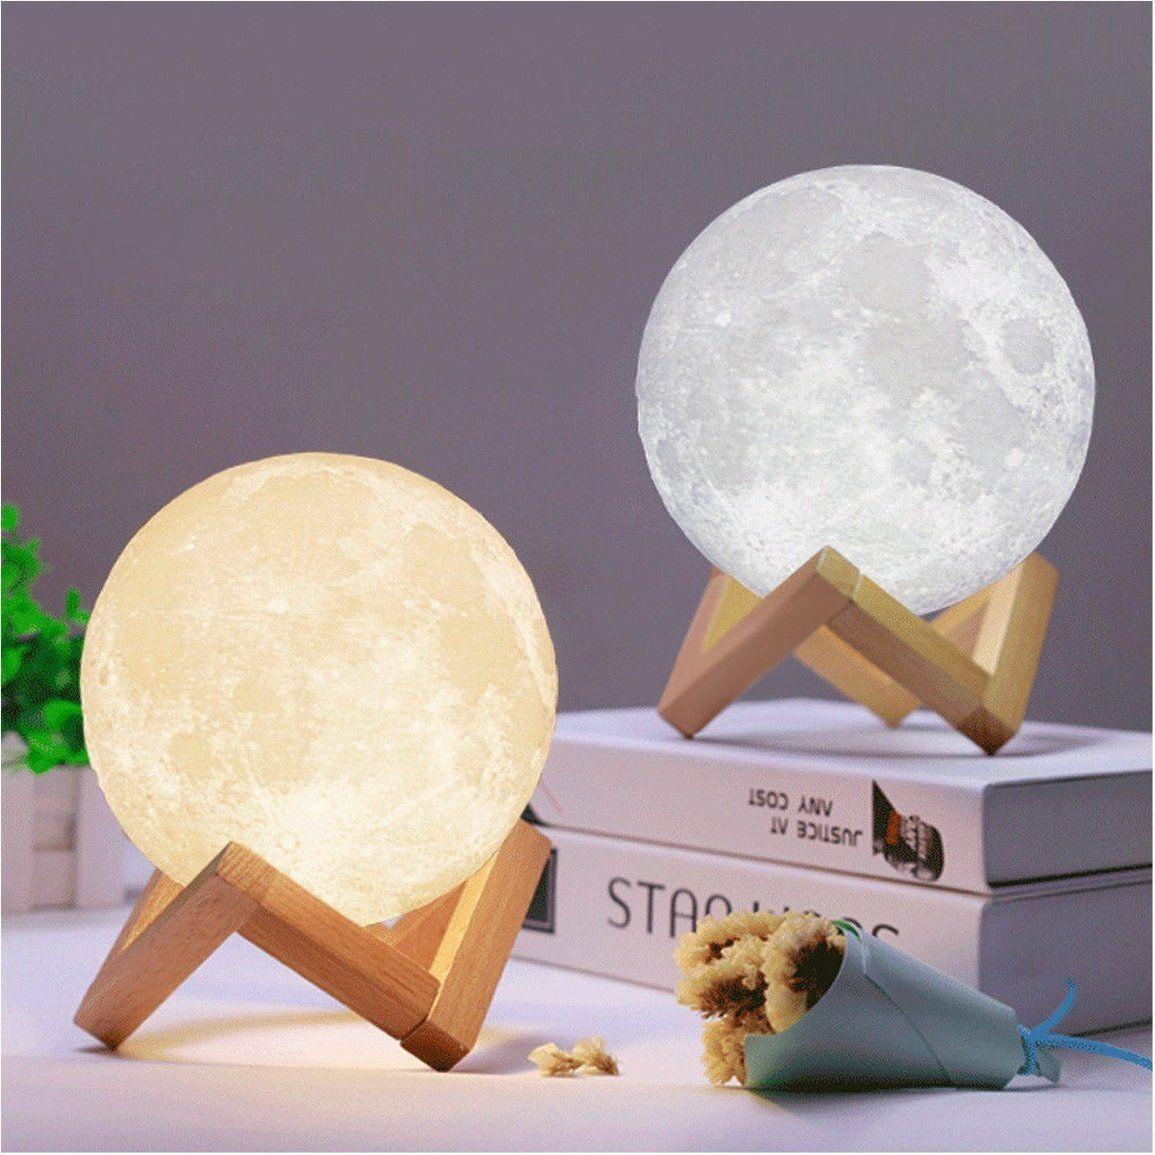 Moon Lamp Home Decor Kitchland Moon Light Lamp Lamp Modern Lamp